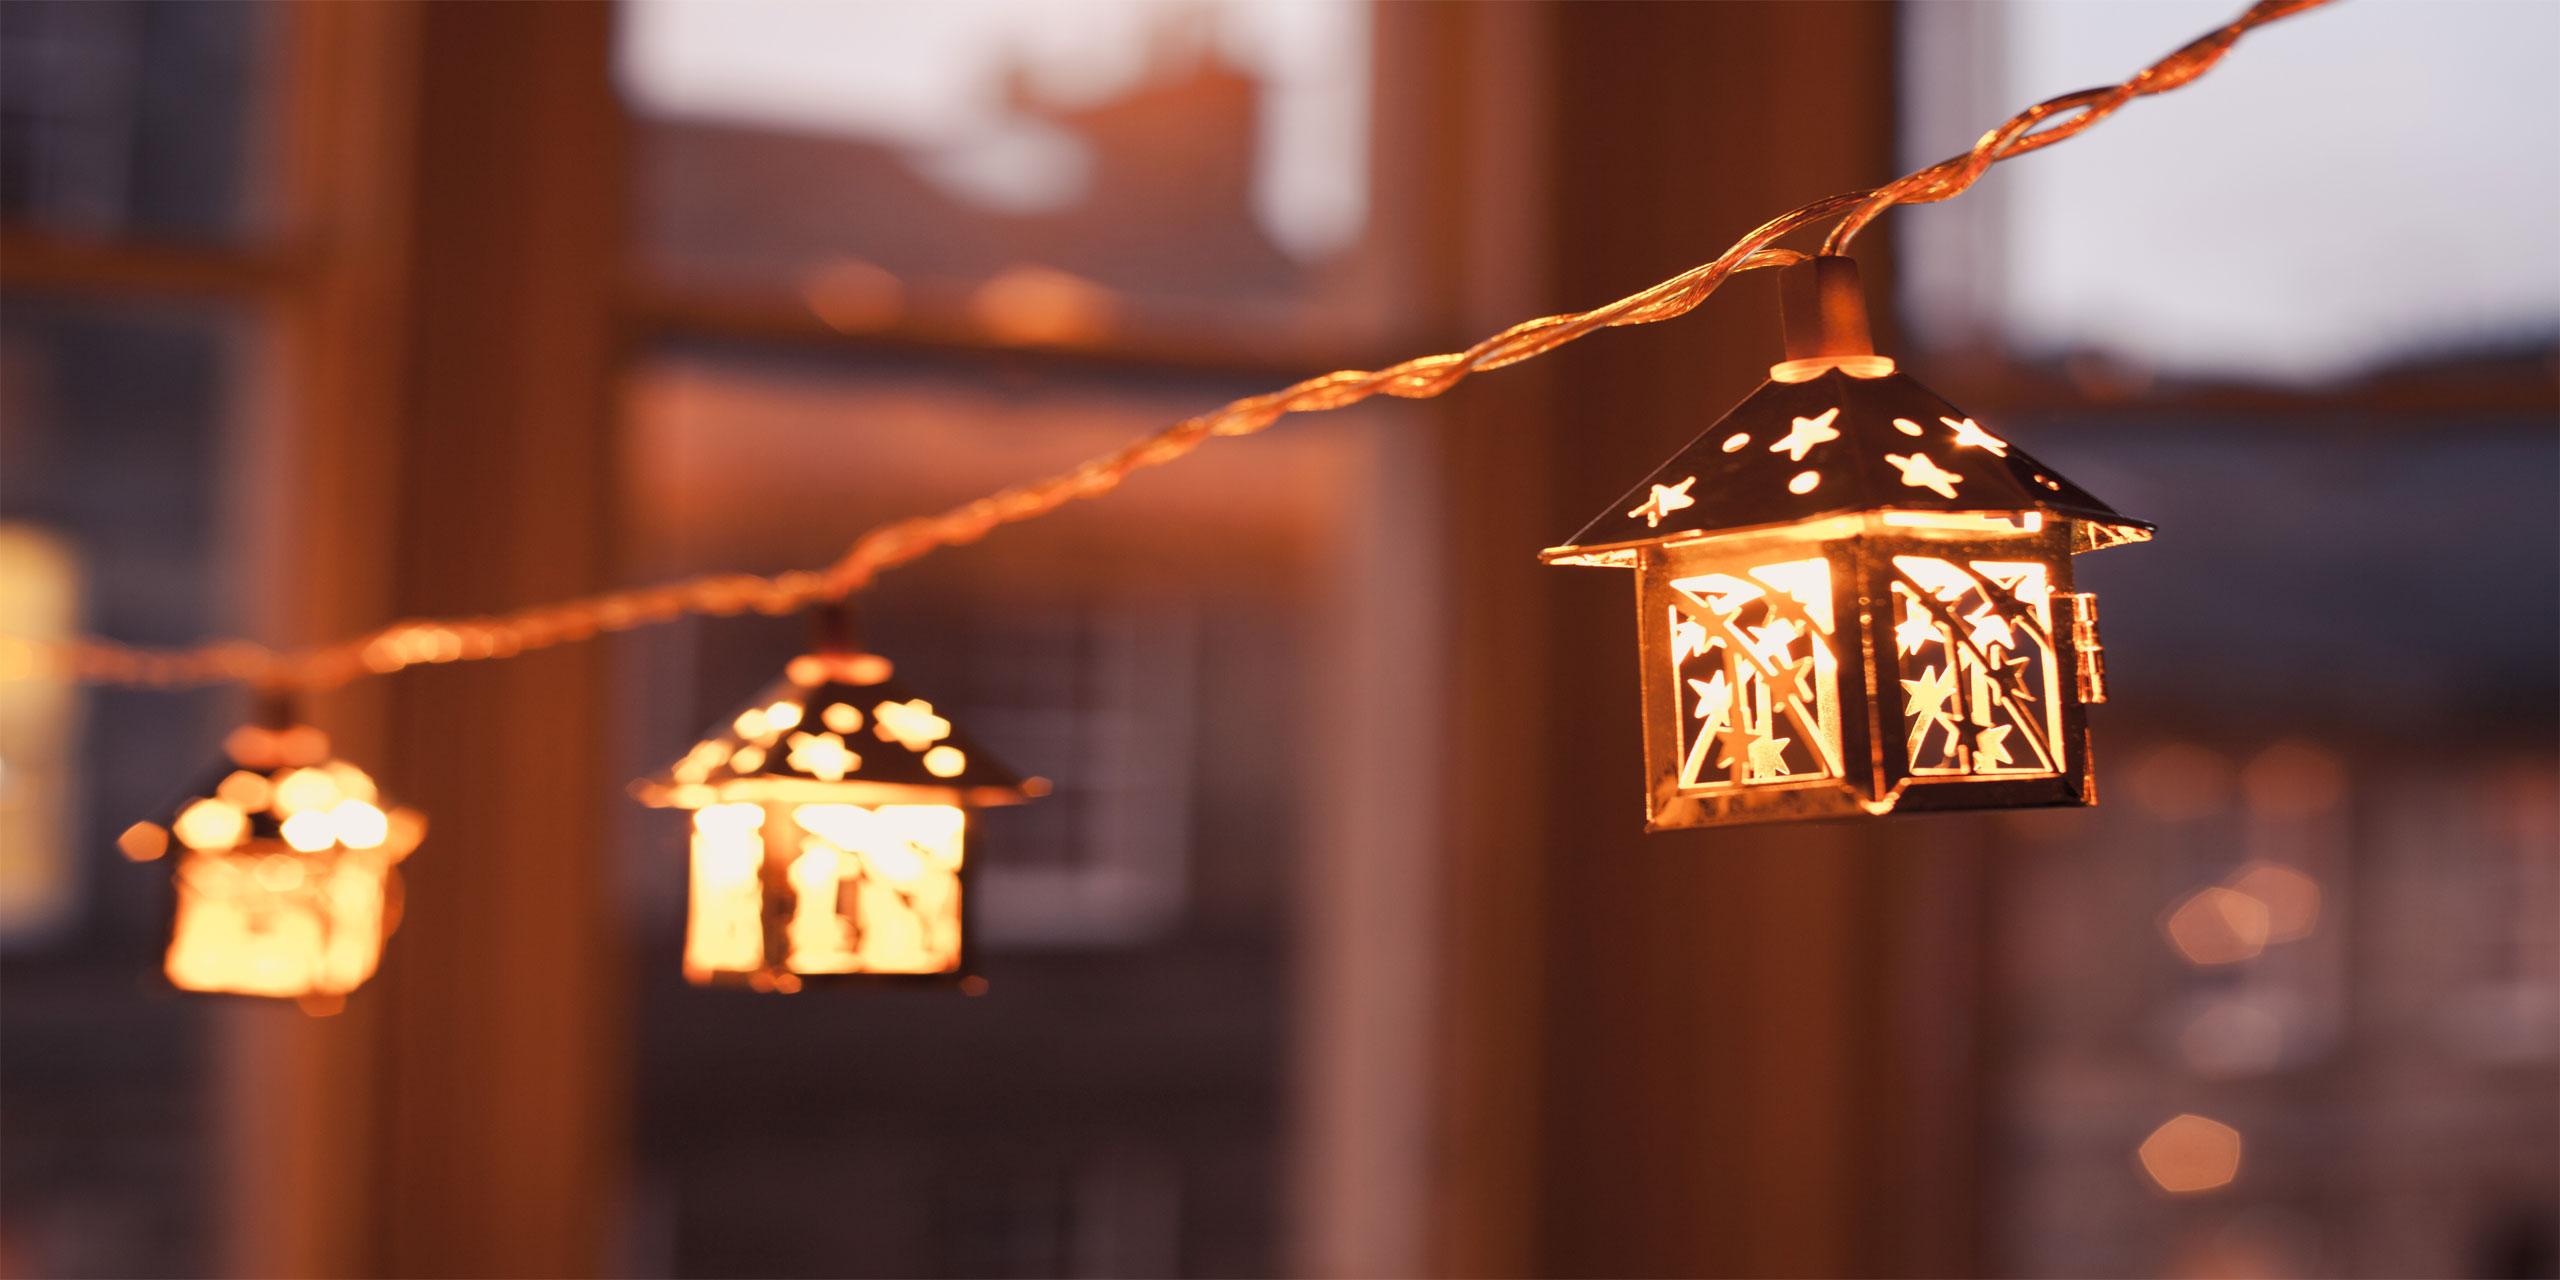 Christmas Decor; Courtesy of Joanna Tkaczuk/Shutterstock.com